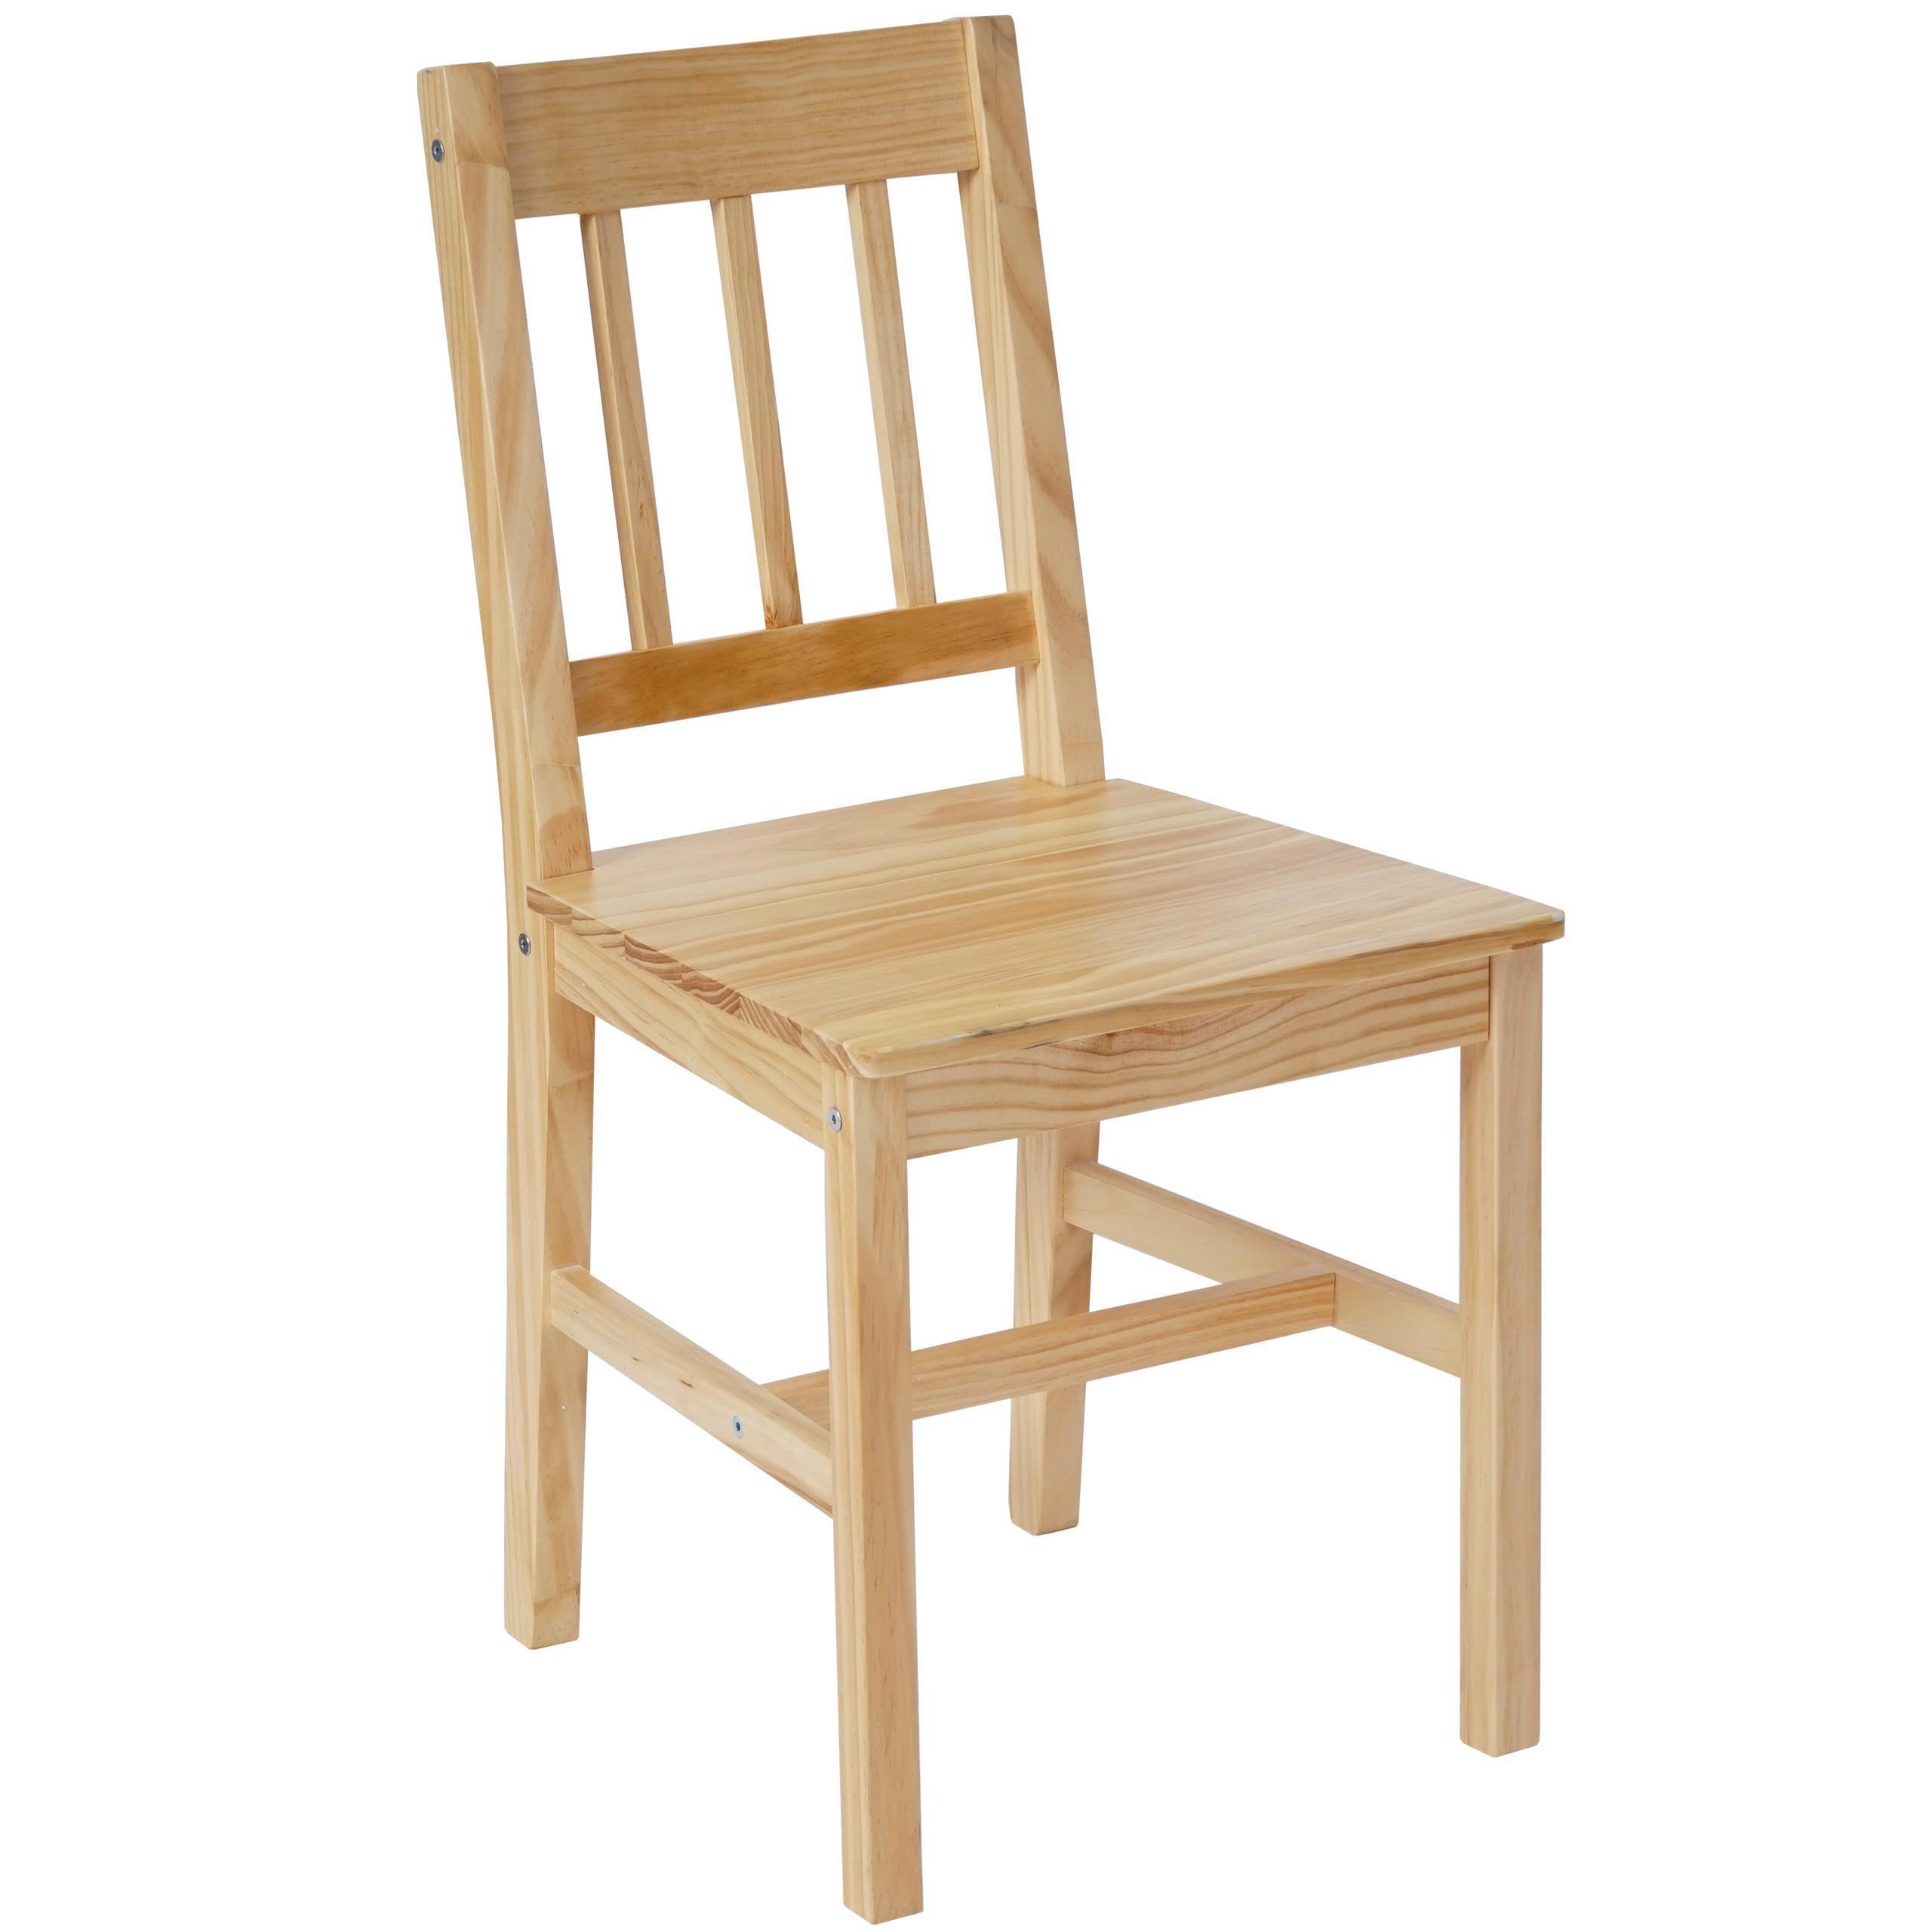 Sillas comedor madera silla comedor blanca con patas de for Sillas de madera